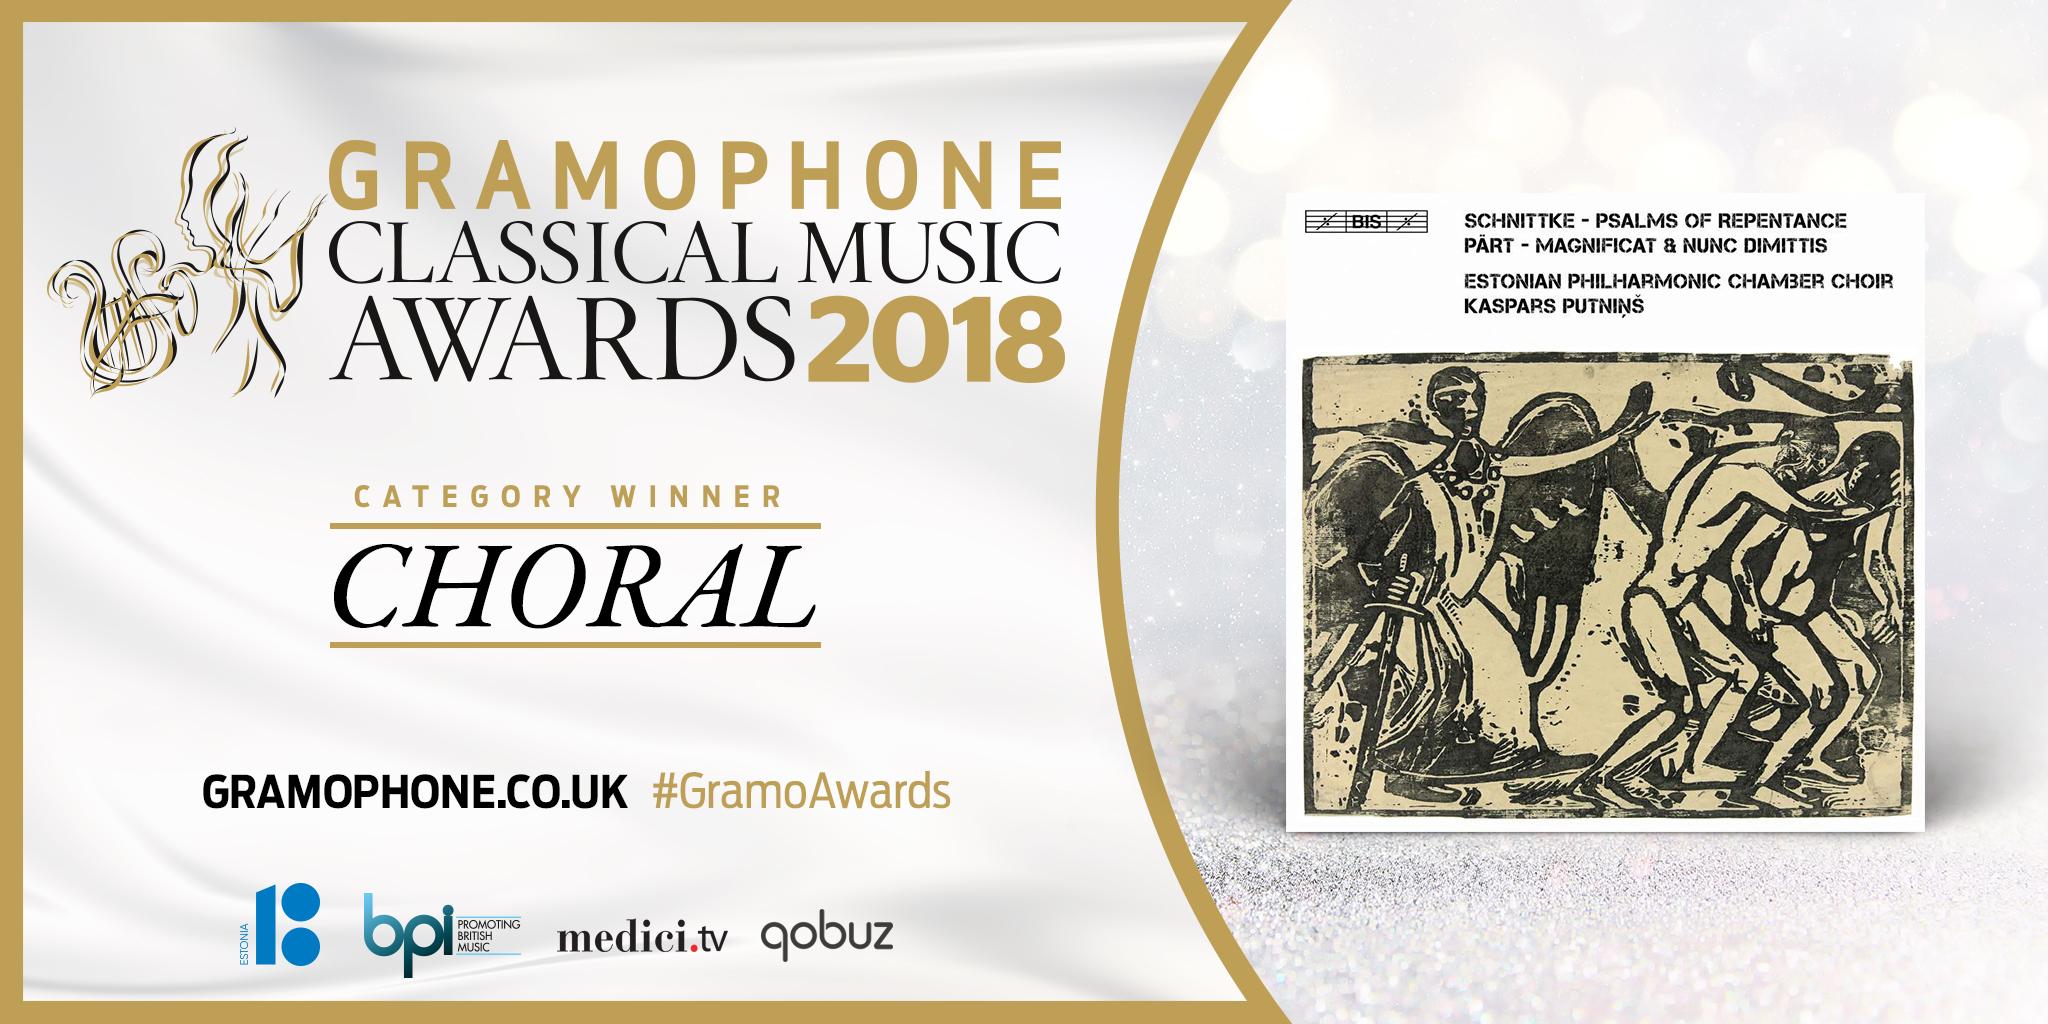 Gramophone Awards 2018